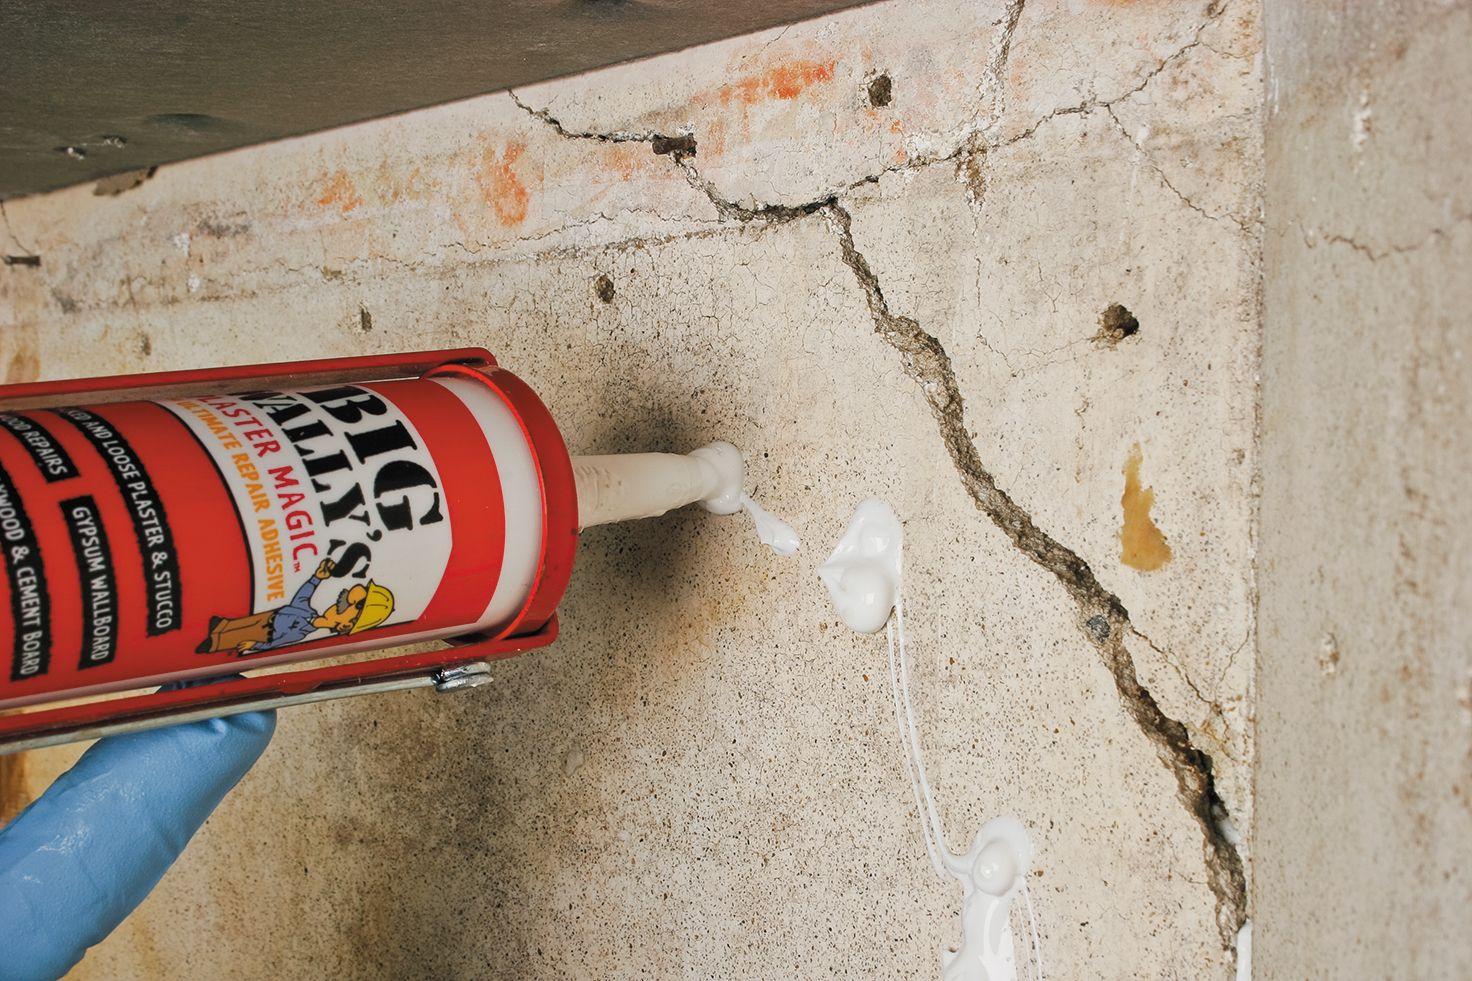 How To Fix Damaged Plaster Plaster Walls Diy Repairing Plaster Walls Plaster Repair